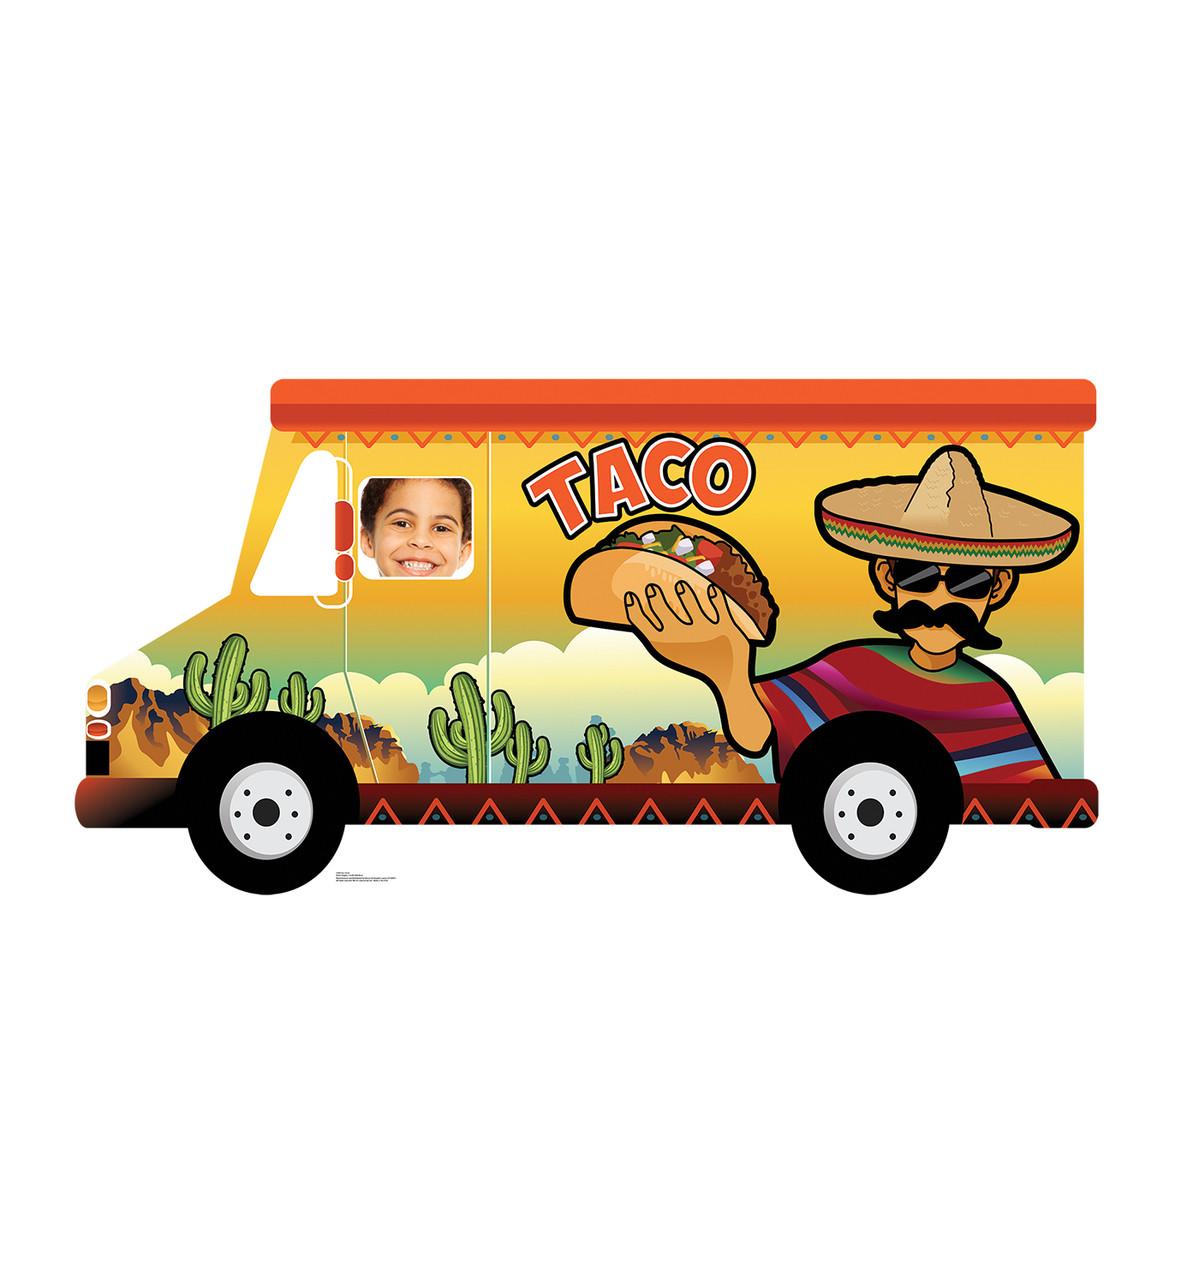 Life-size Taco Truck Standin Cardboard Standup 2